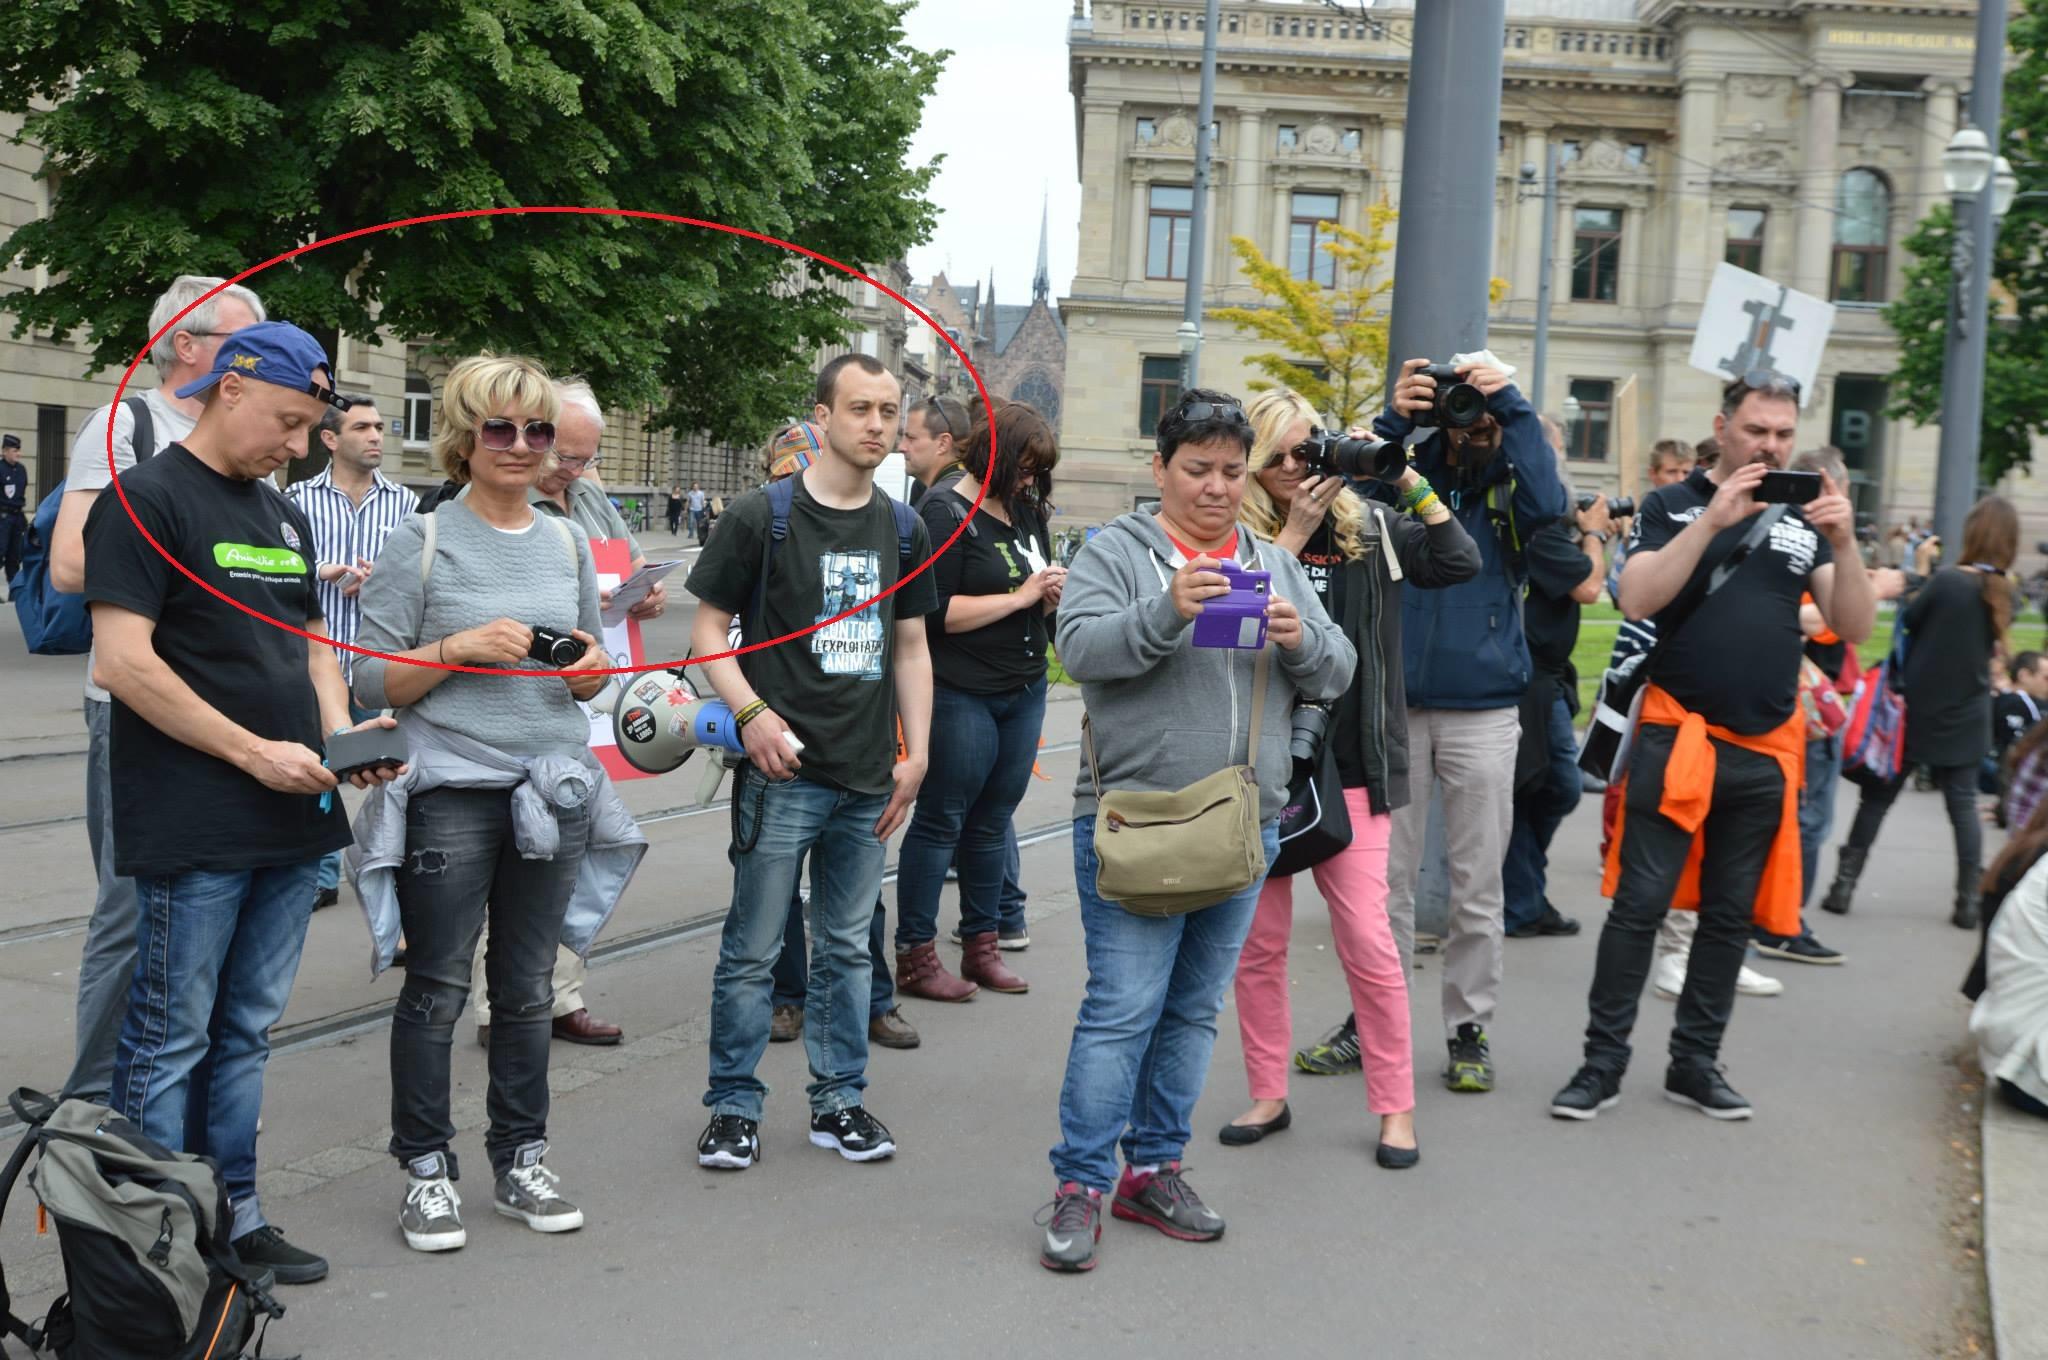 Christophe Leprêtre et Jérémy Lebouter avec Nathalie Krier en mai 2015 à Strasbourg